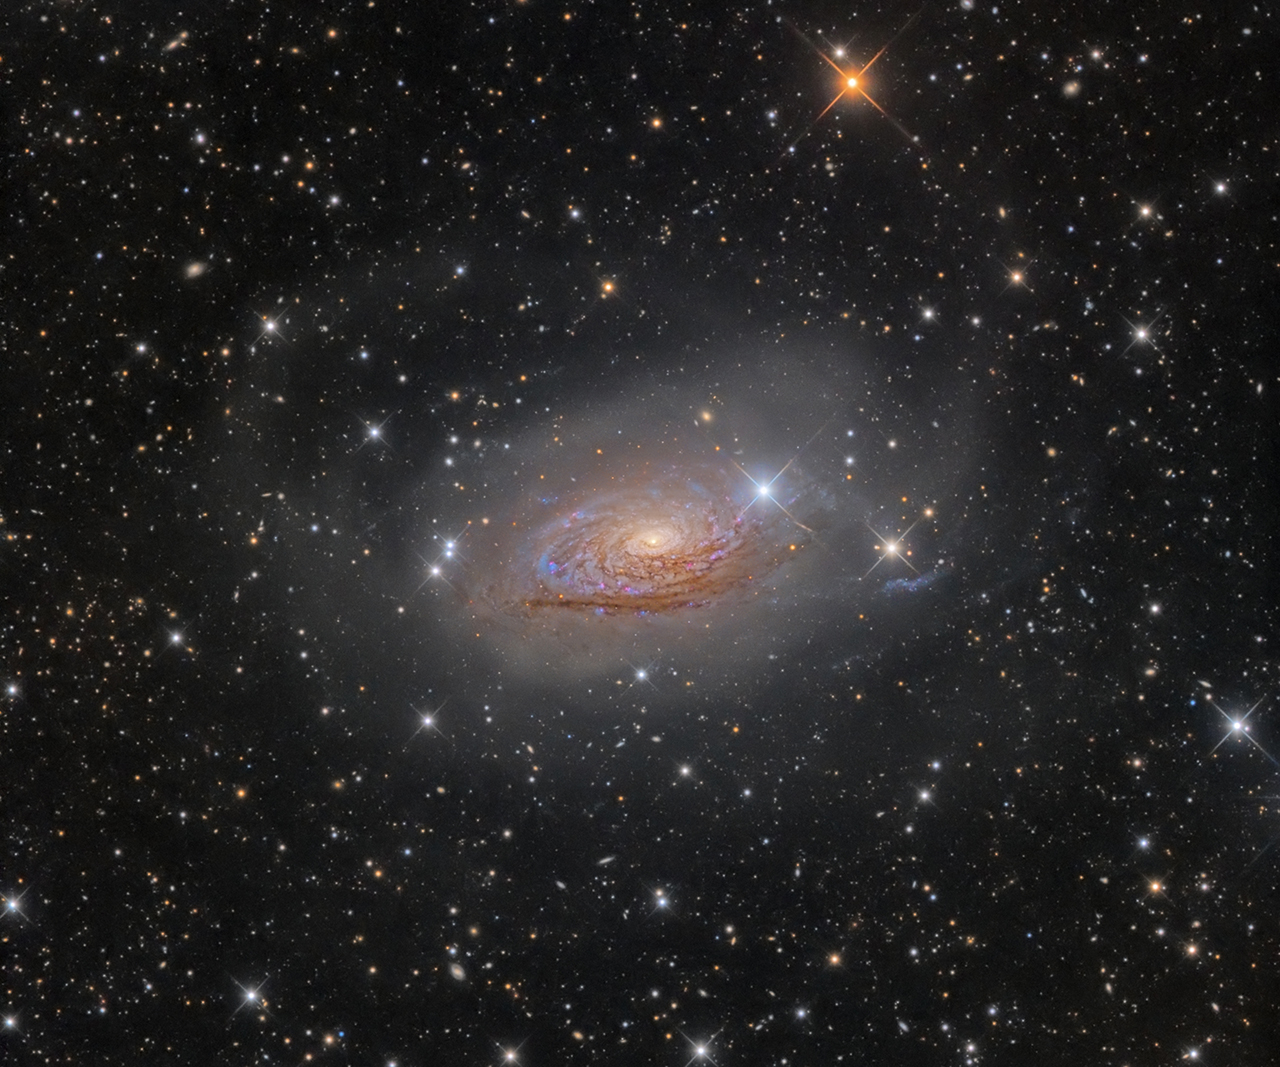 M63 Star Streams and the Sunflower Galaxy © Oleg Bryzgalov